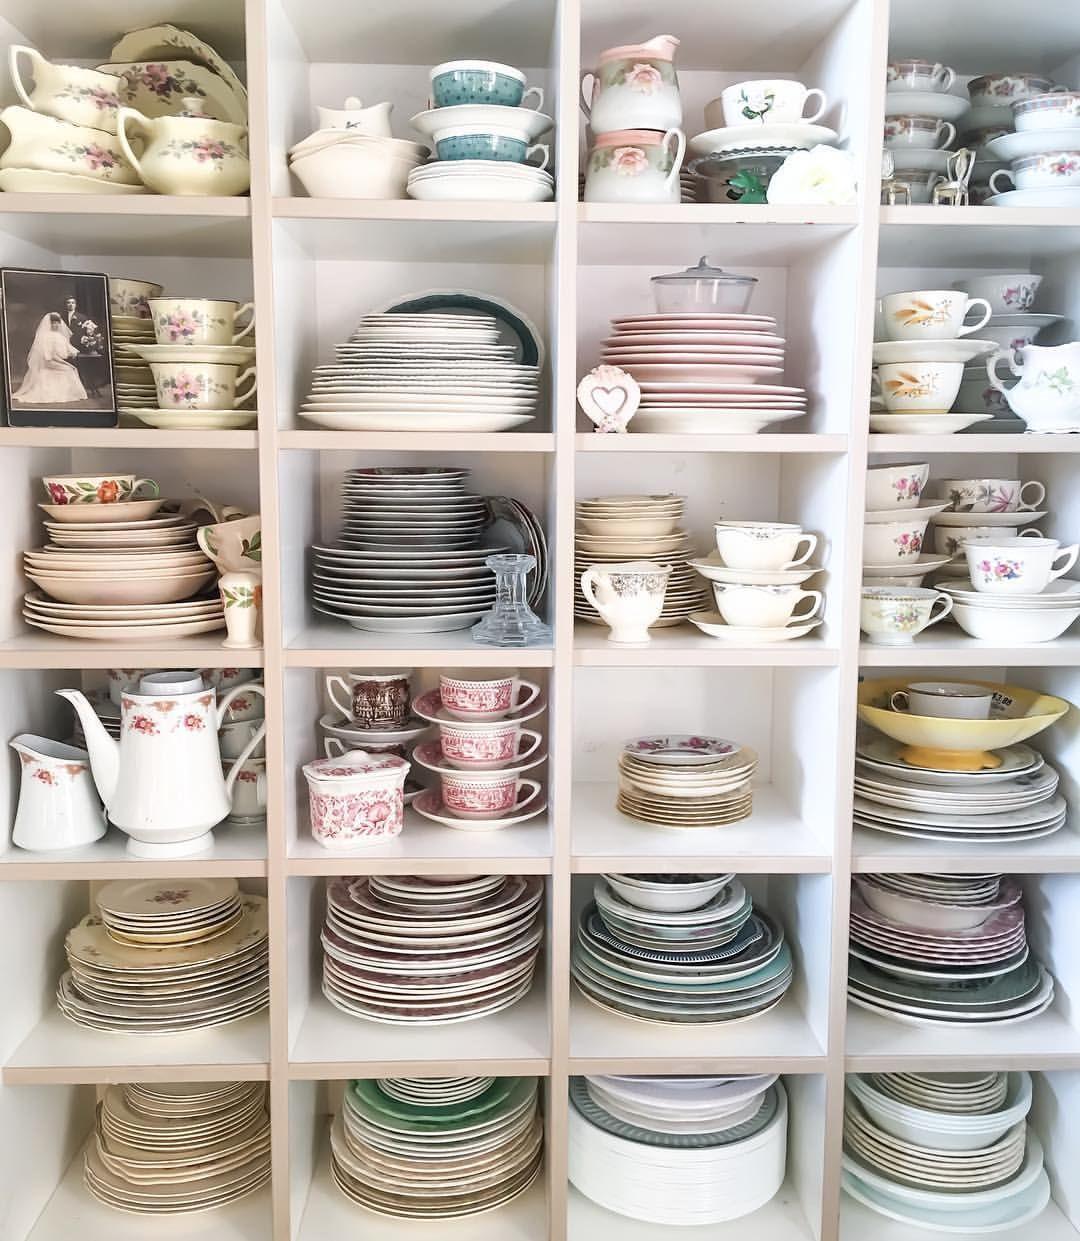 Organizar a casa, louças organizadas